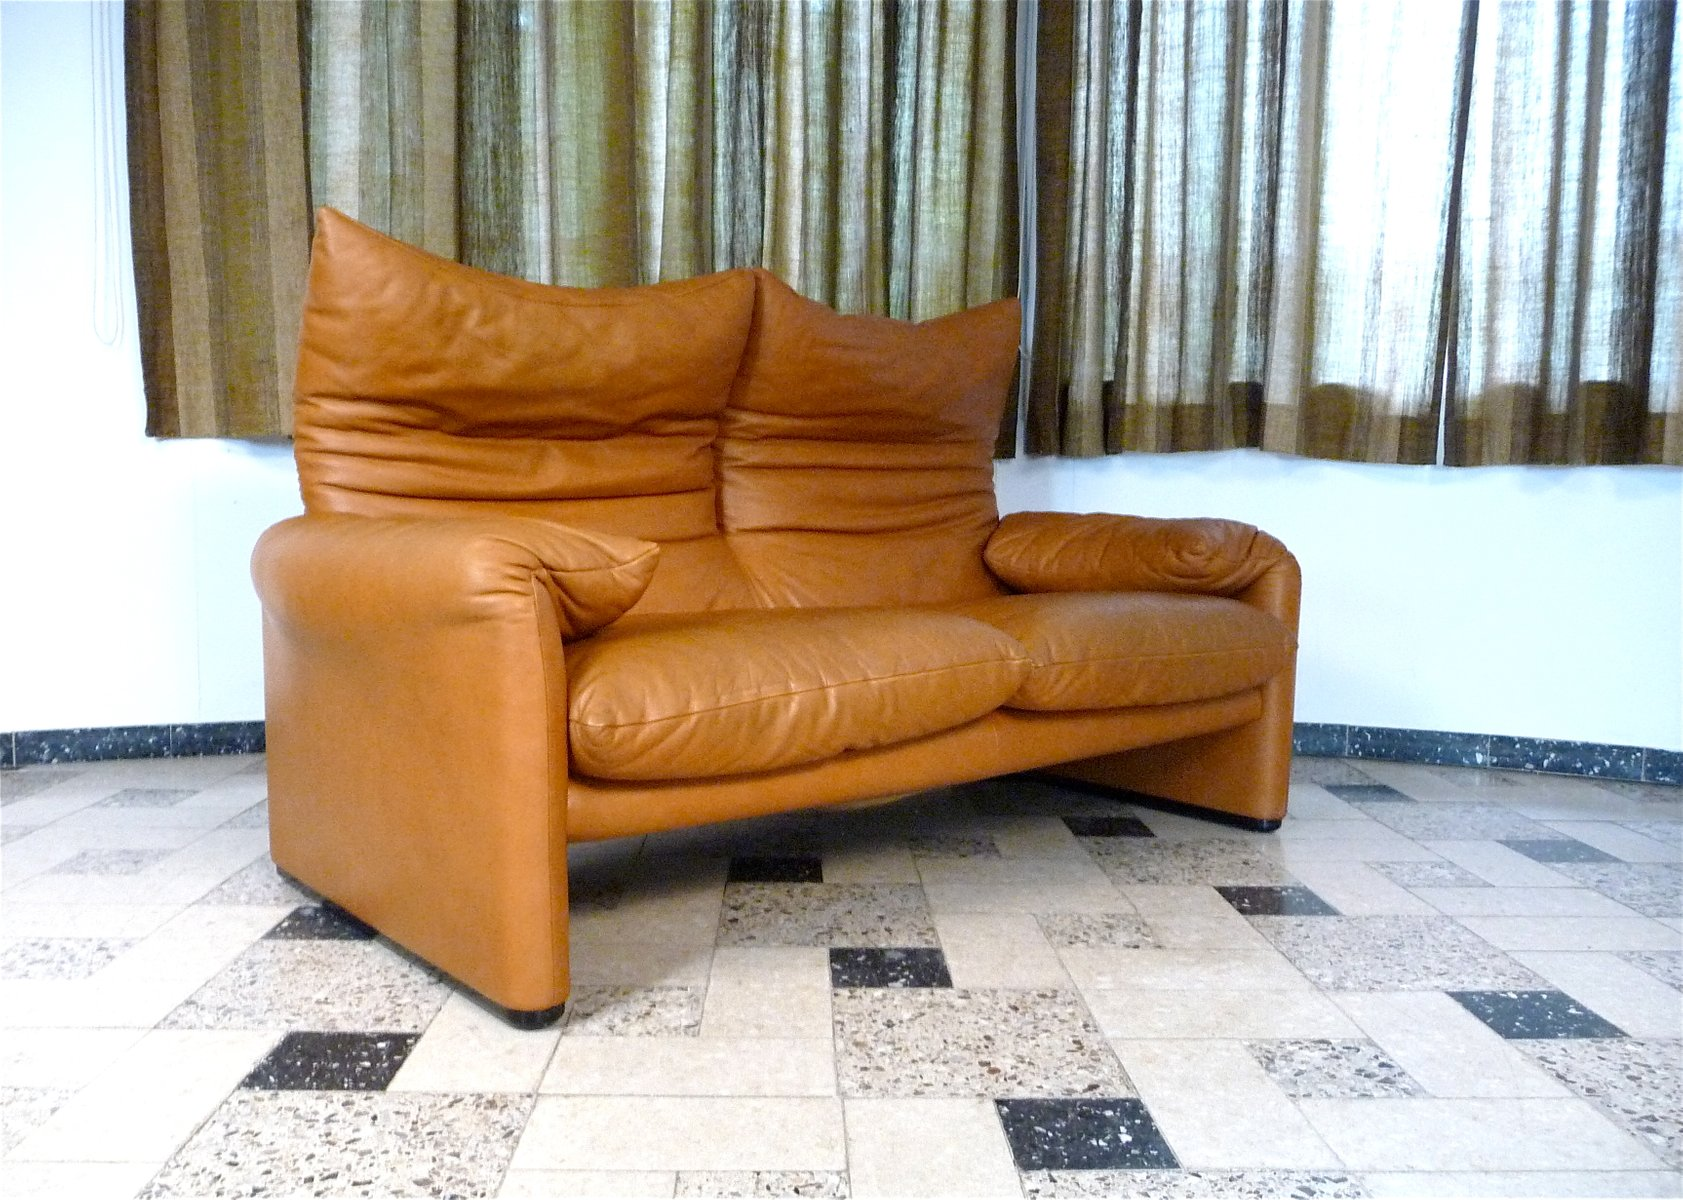 maralunga 2 sitzer ledersofa von vico magistretti f r cassina 1970er bei pamono kaufen. Black Bedroom Furniture Sets. Home Design Ideas